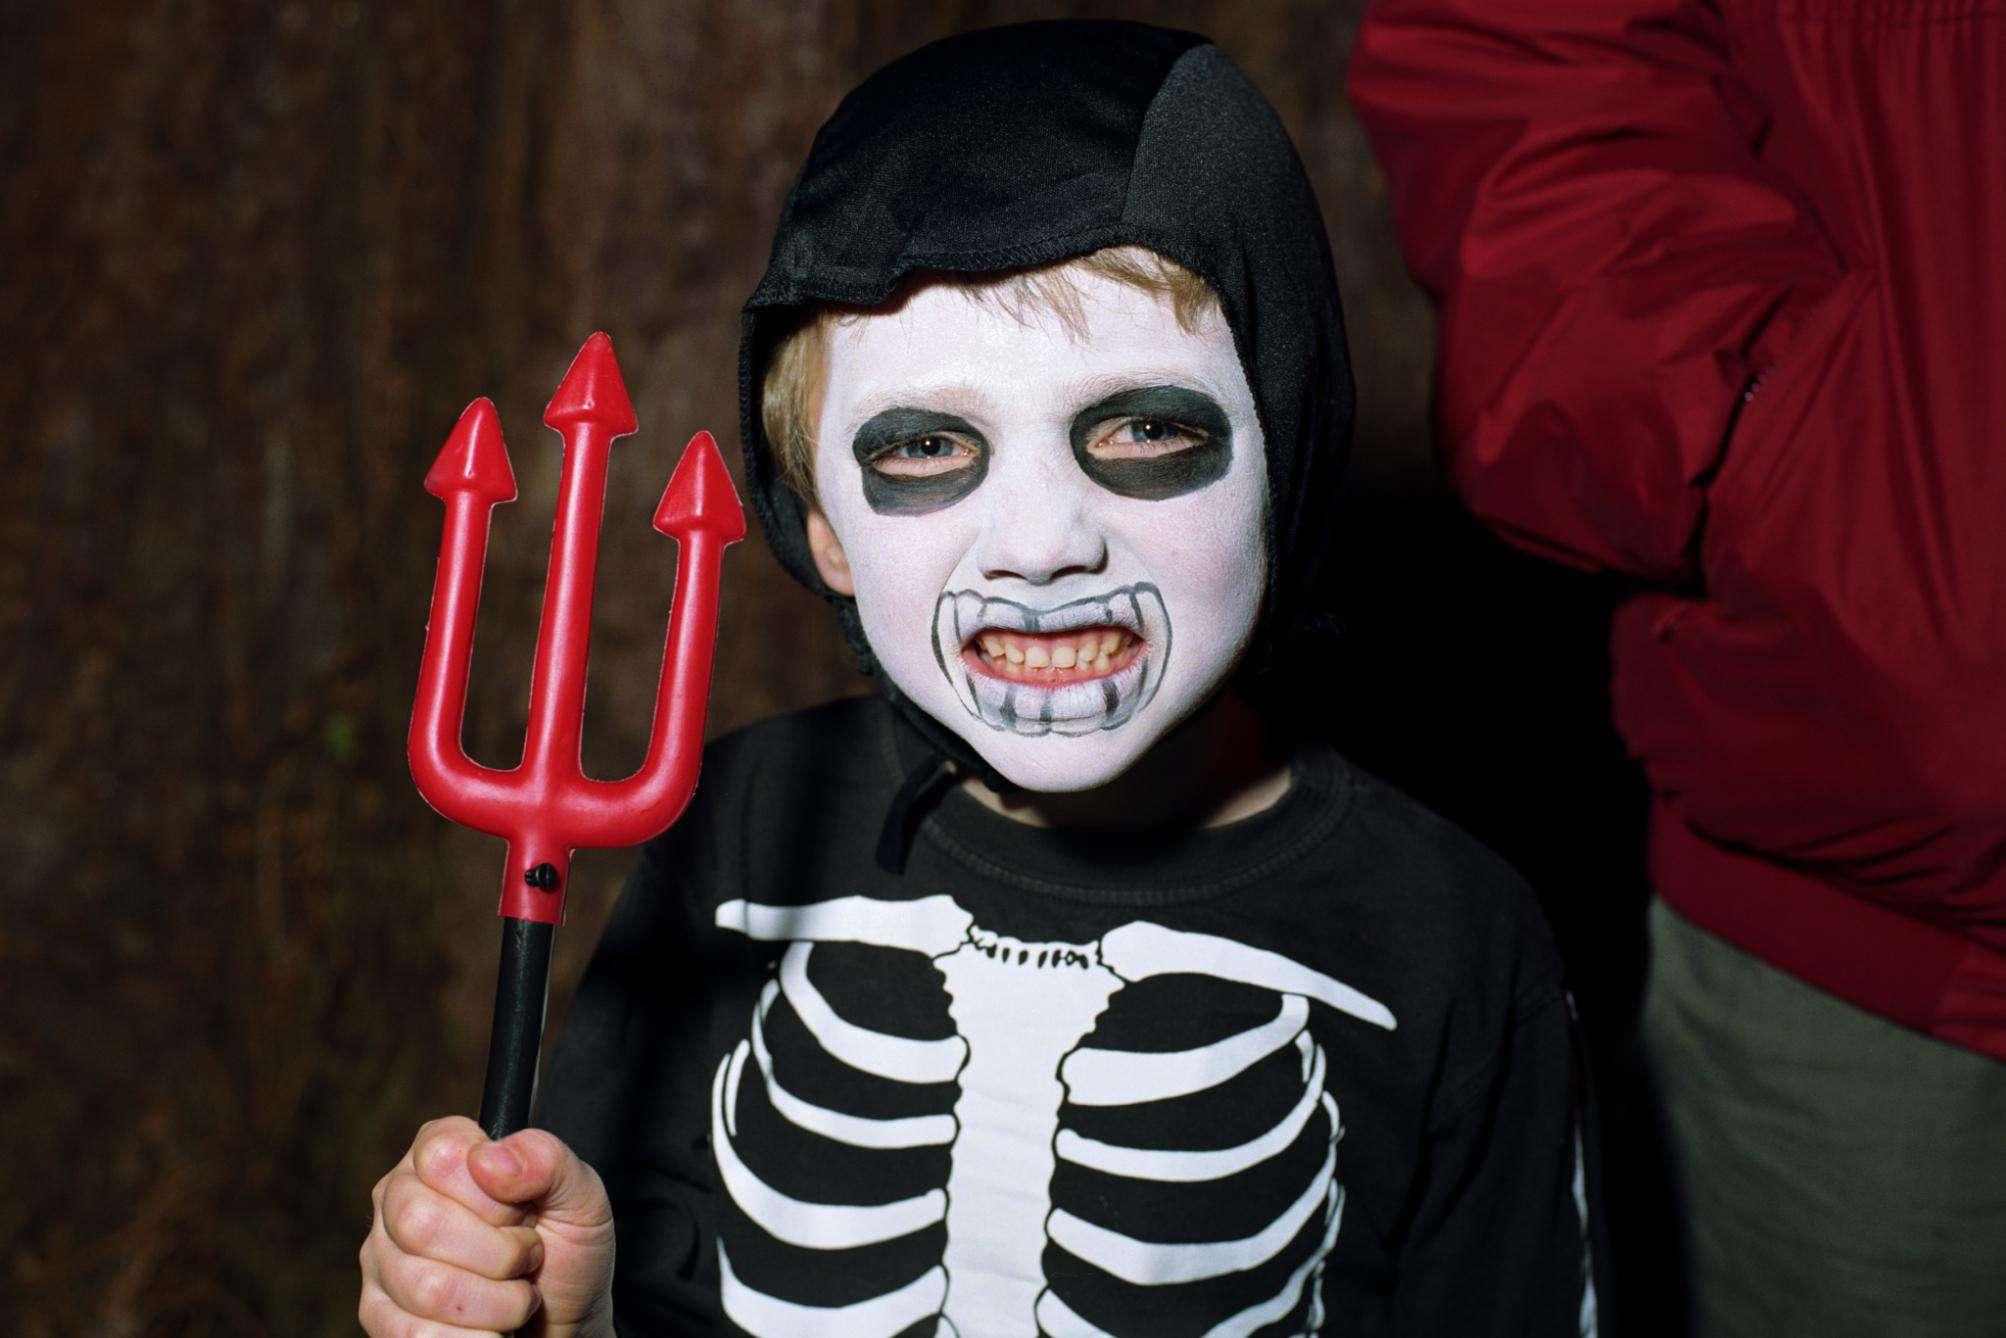 Boy wearing skeleton costume, portrait, close-up